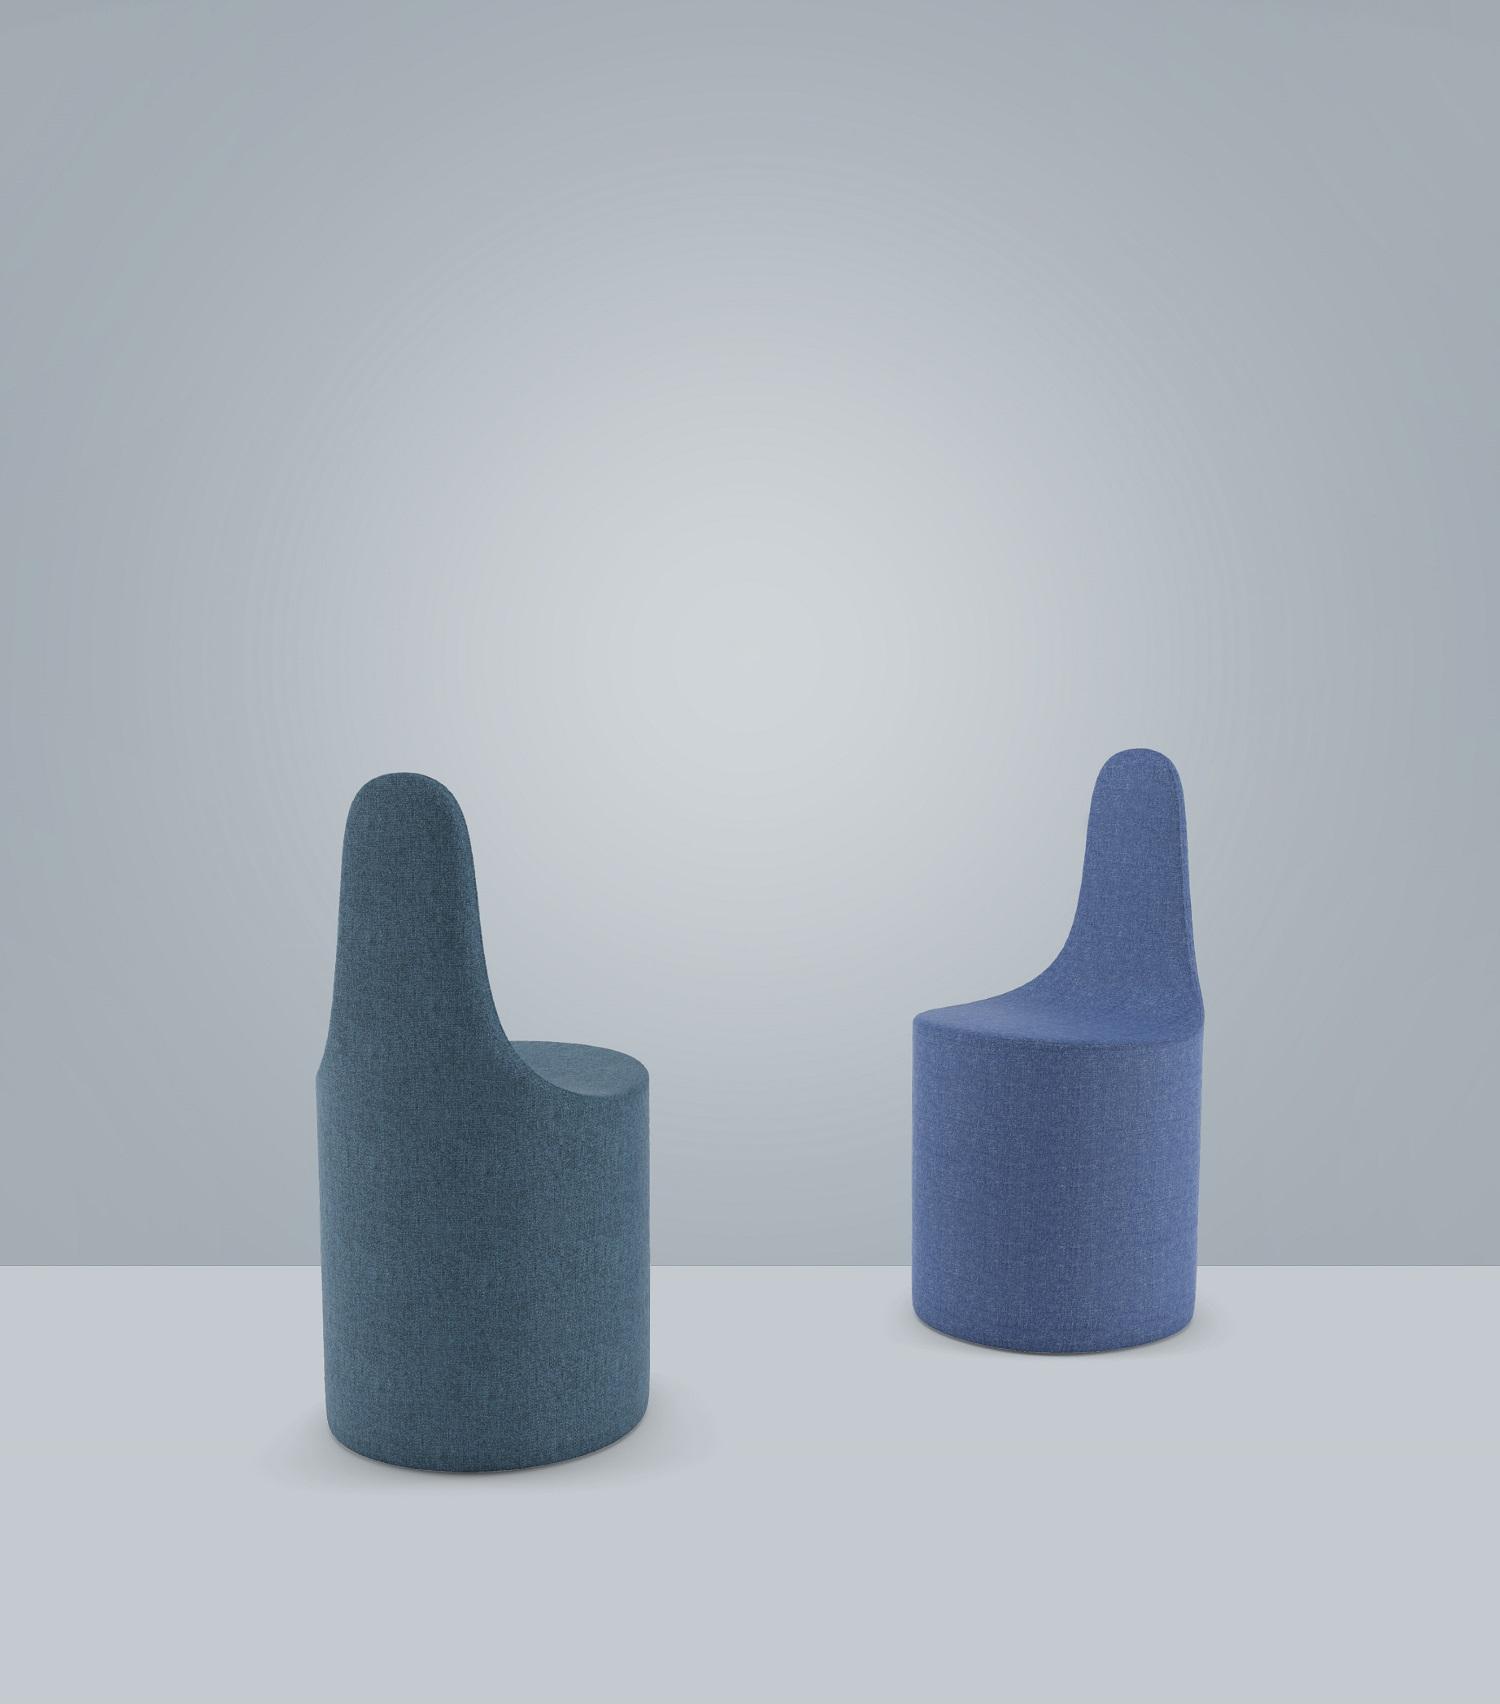 01_Estel_Comfort&Relax_Chairs&Stool_Landscape